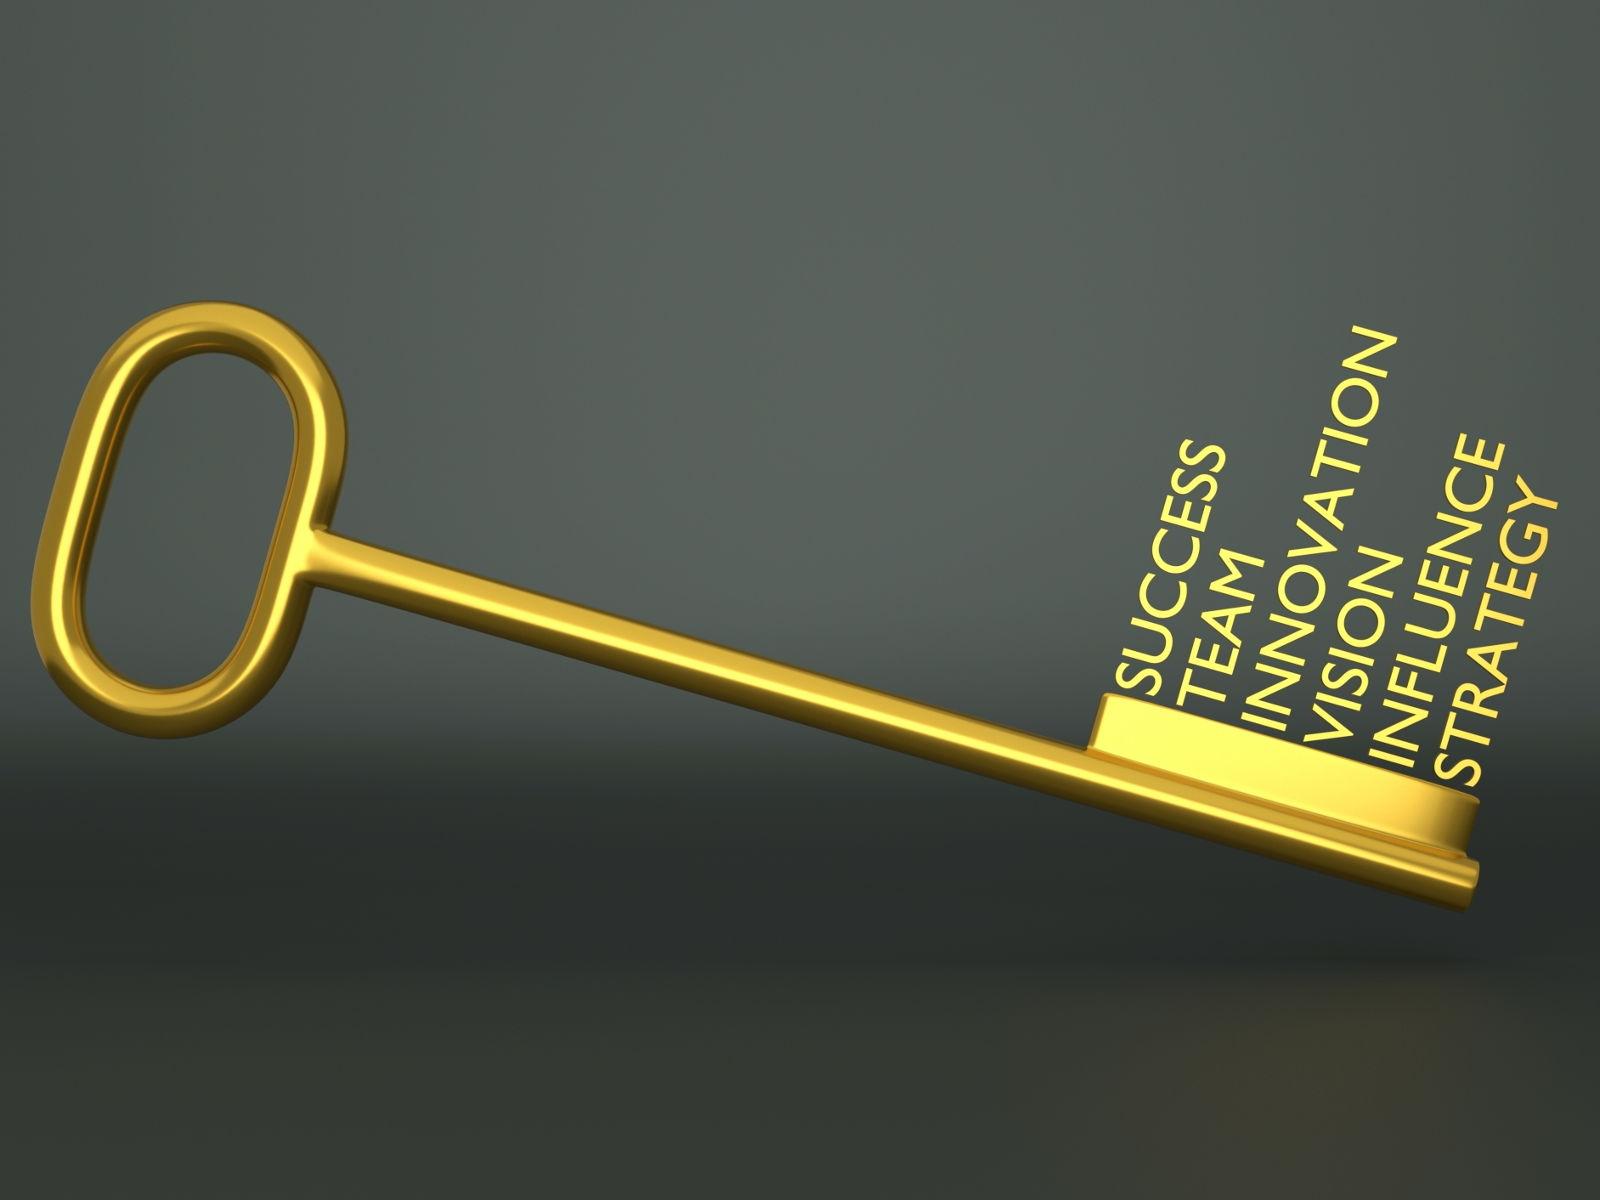 llave, éxito, inovación, visión, influencia, estrategia